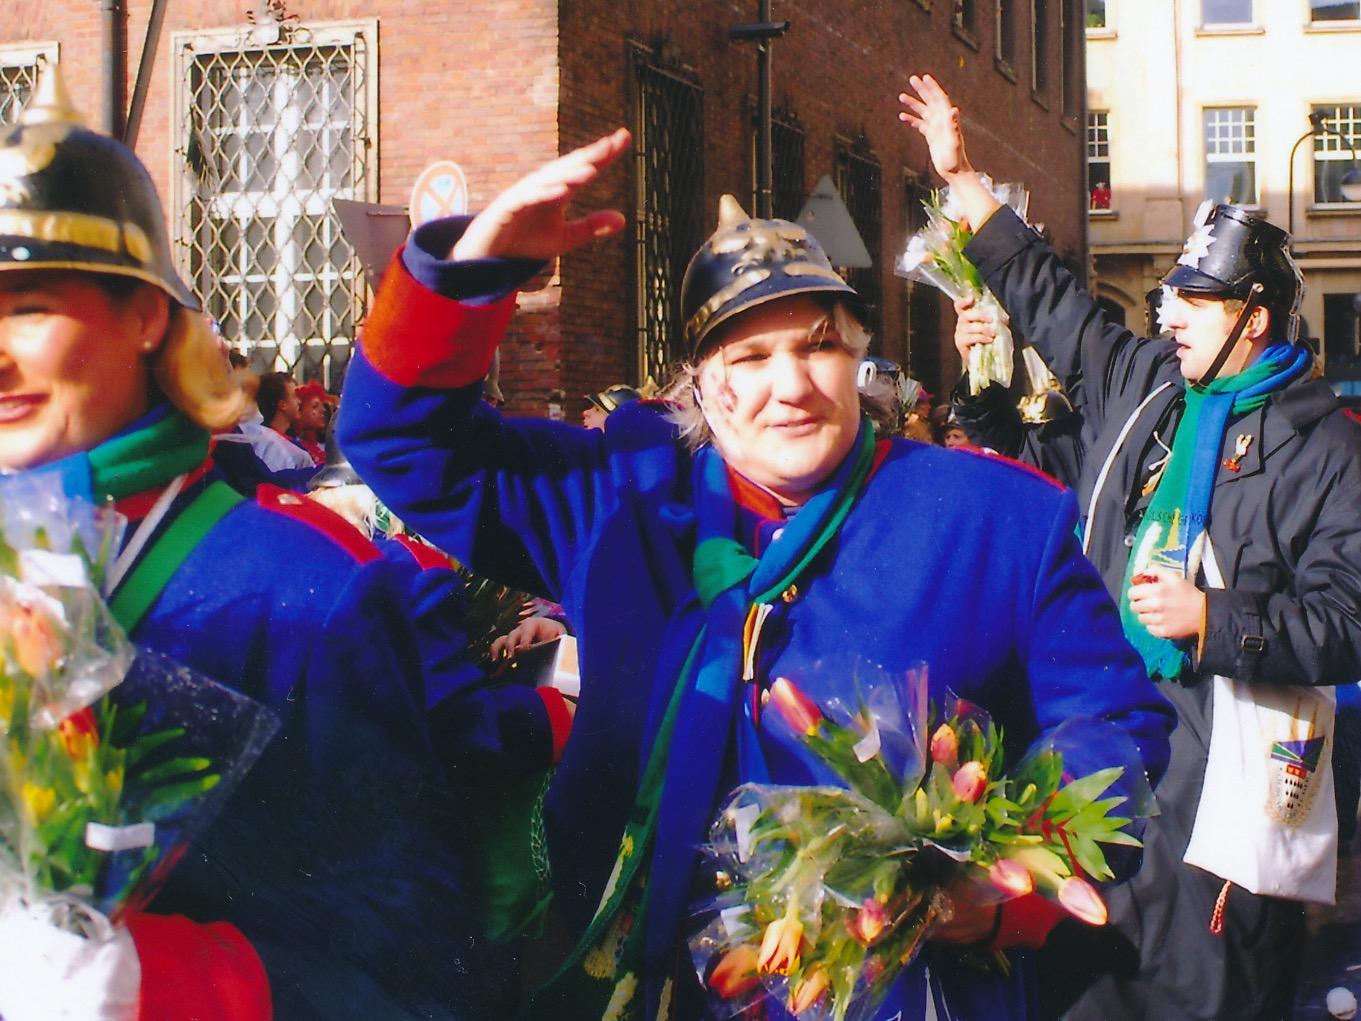 2009 Rosenmontagszug